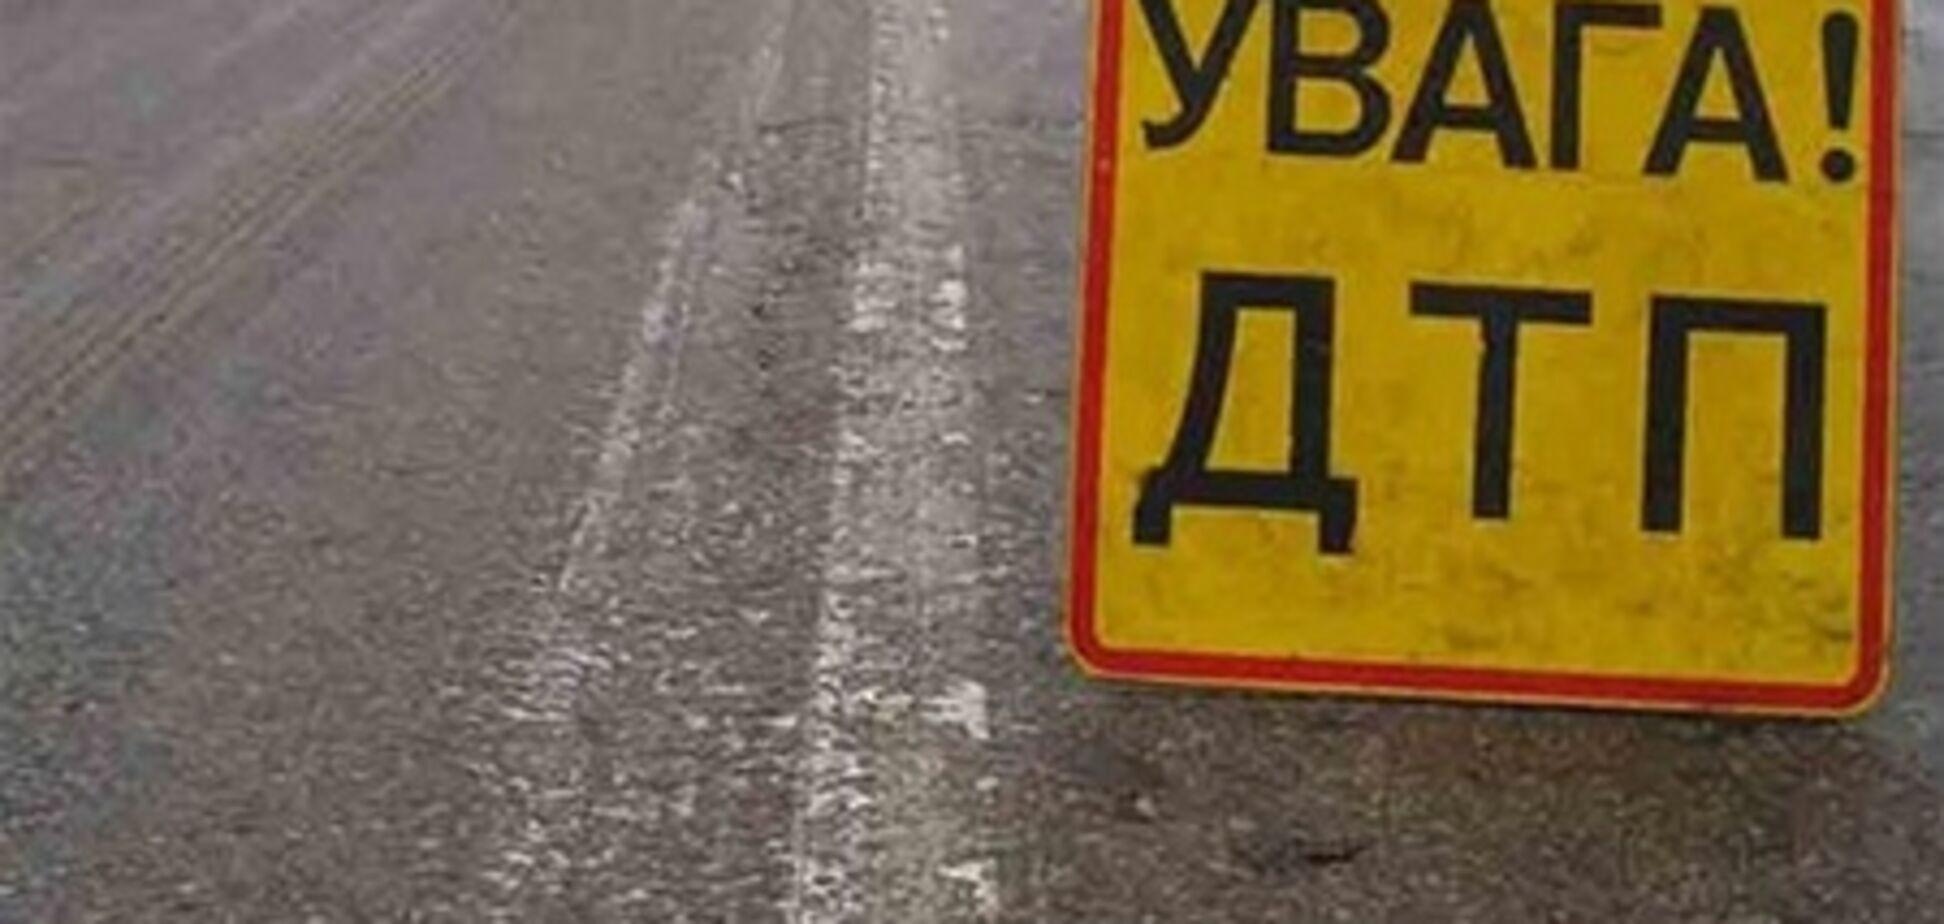 Ситуация на дорогах за 7 марта: 72 ДТП, 8 погибших